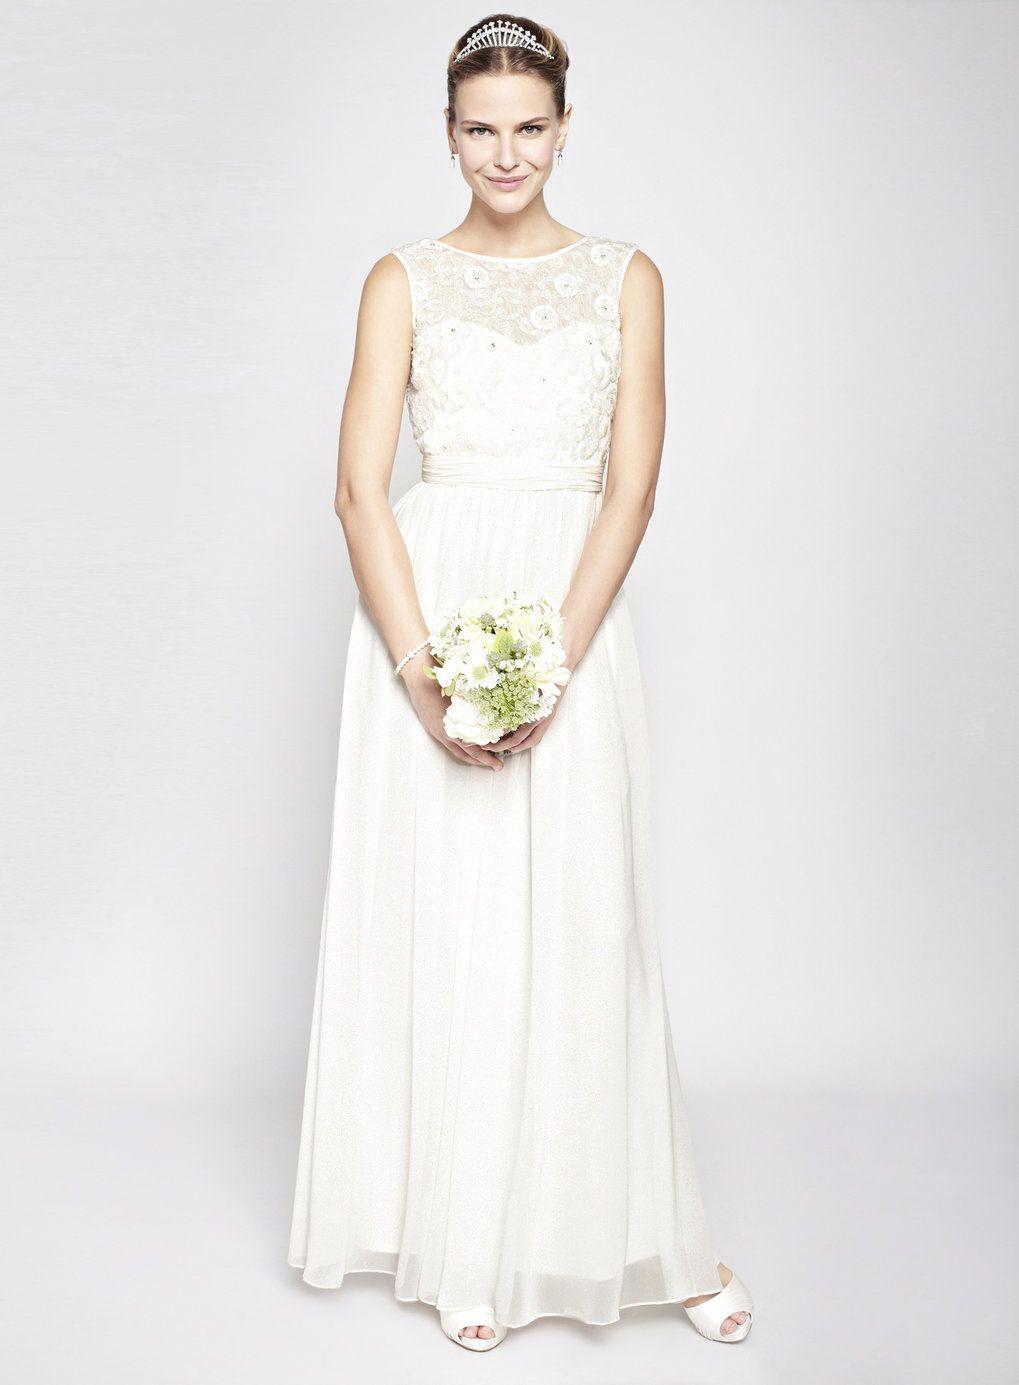 Attractive Bhs Purple Bridesmaid Dress Sketch - Wedding Dress Ideas ...